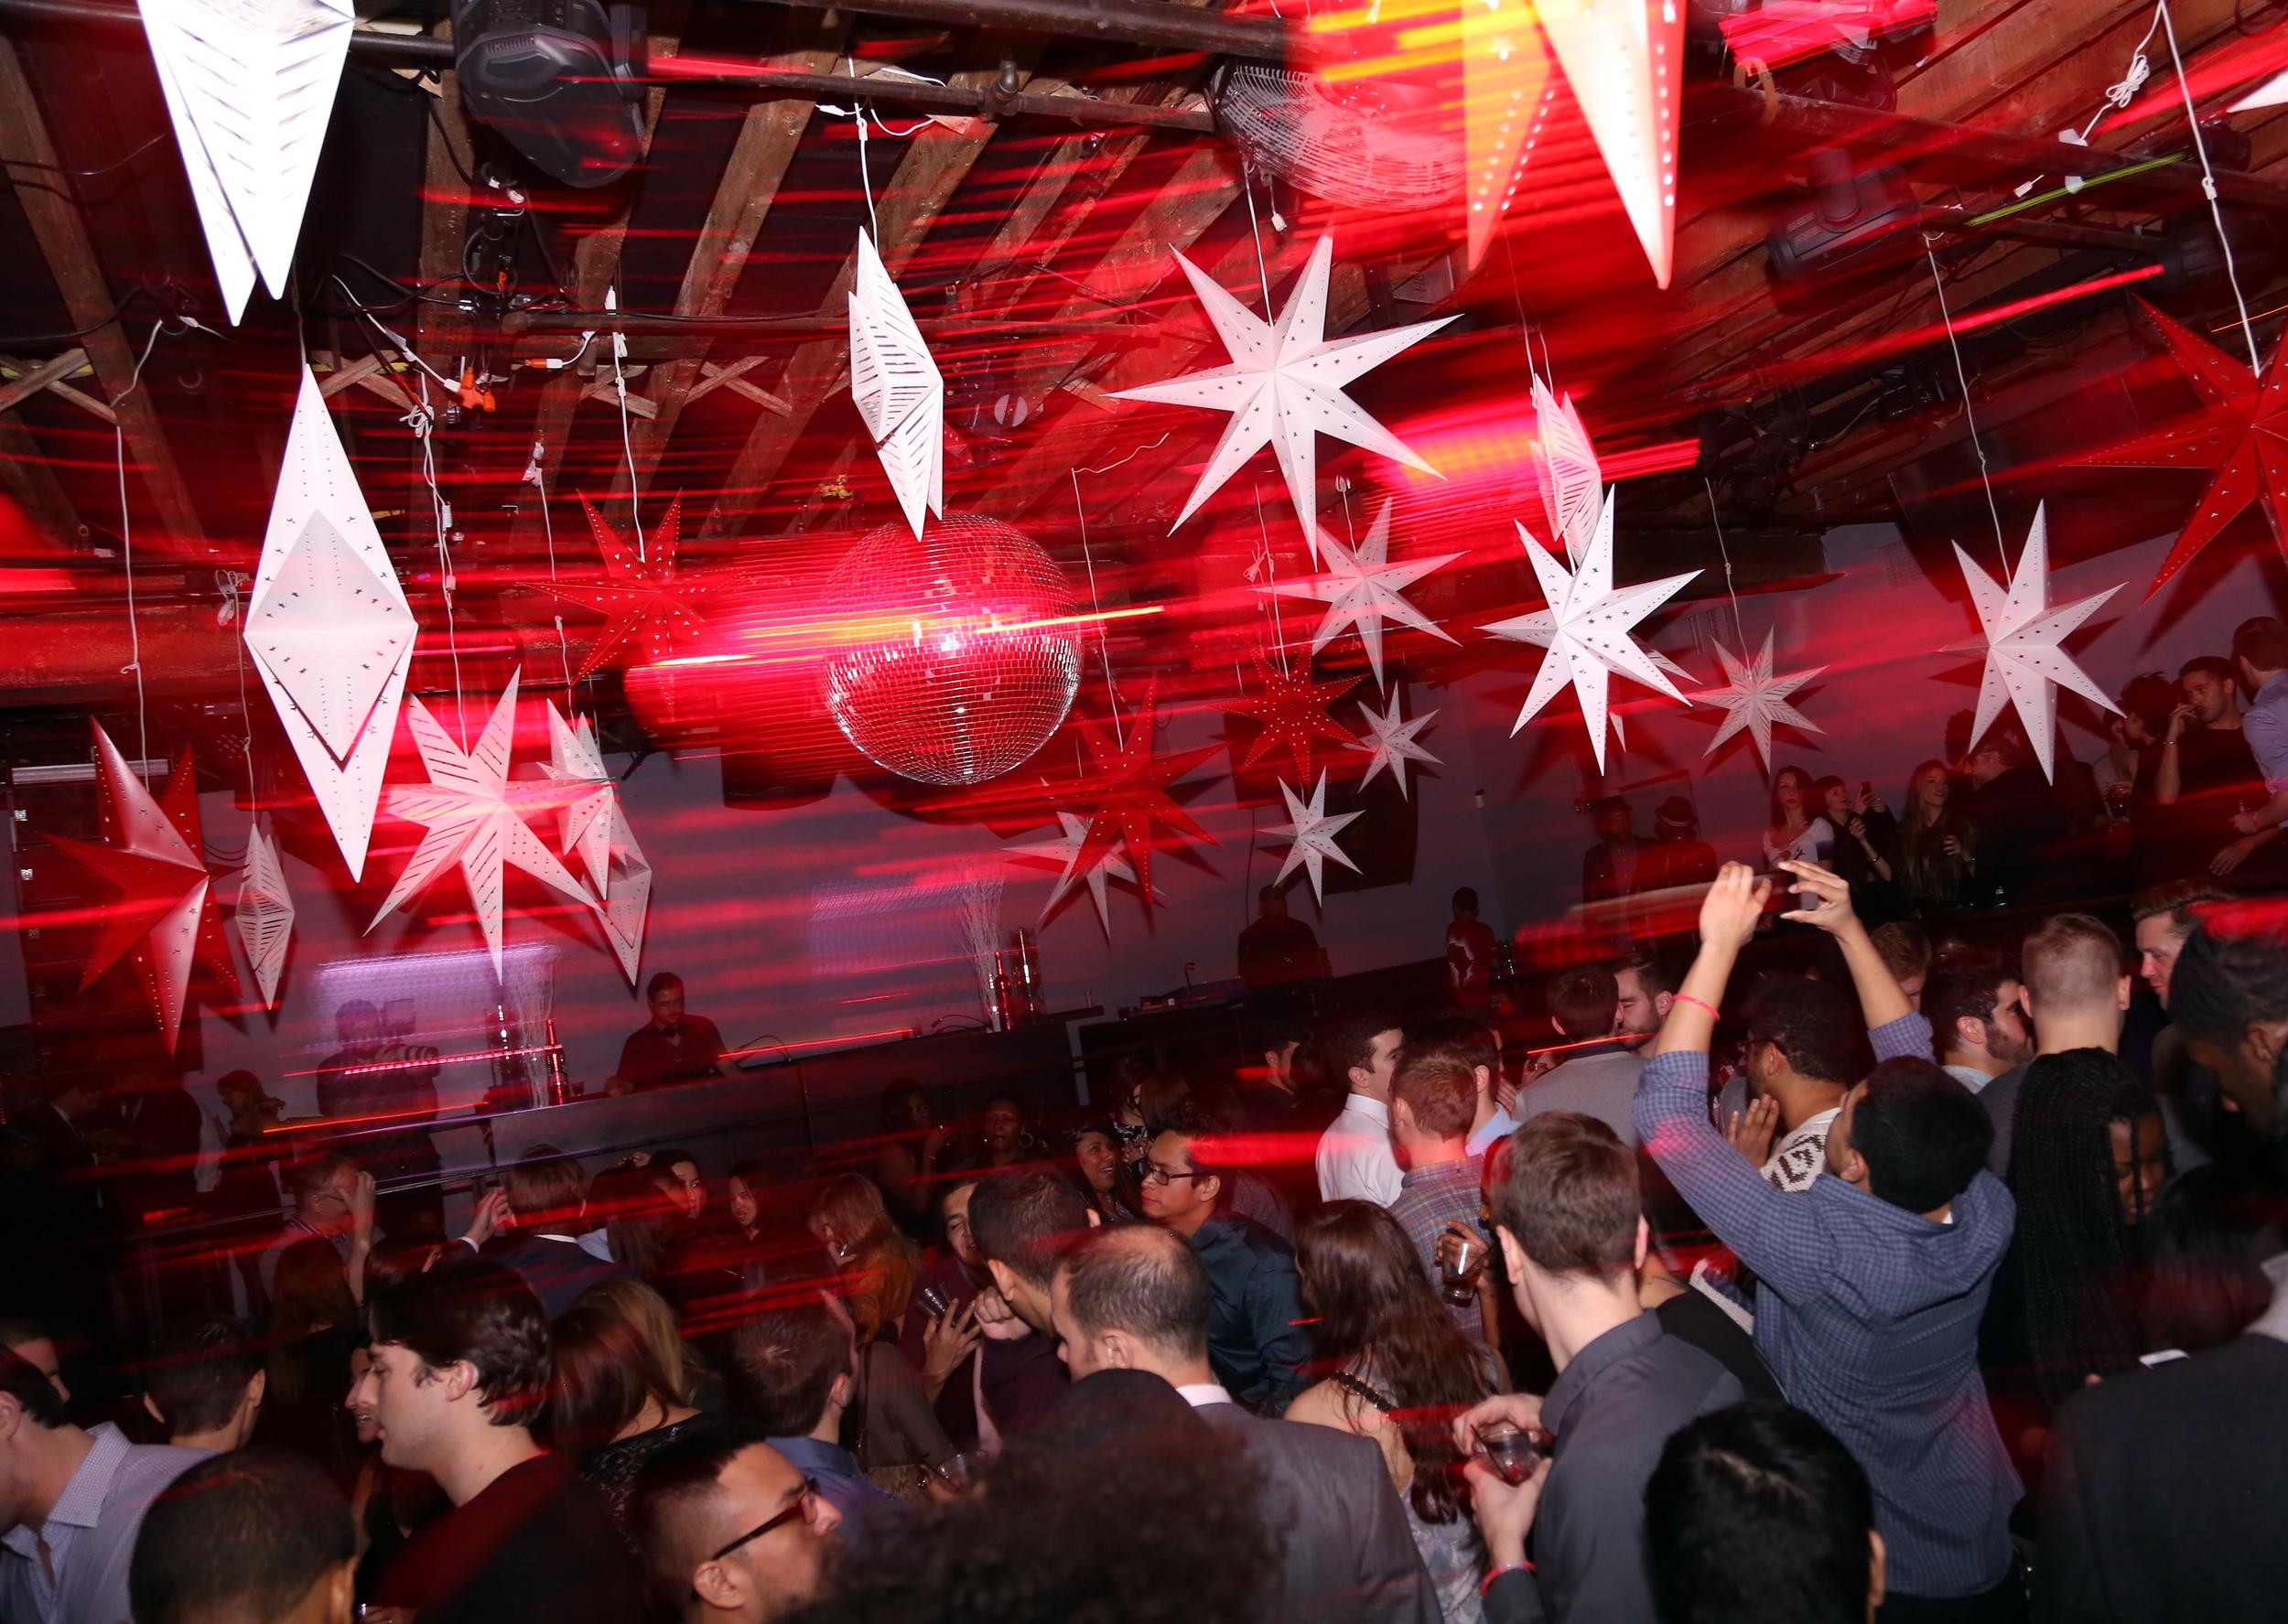 Belvedere Red Party - Verboten, Brooklyn